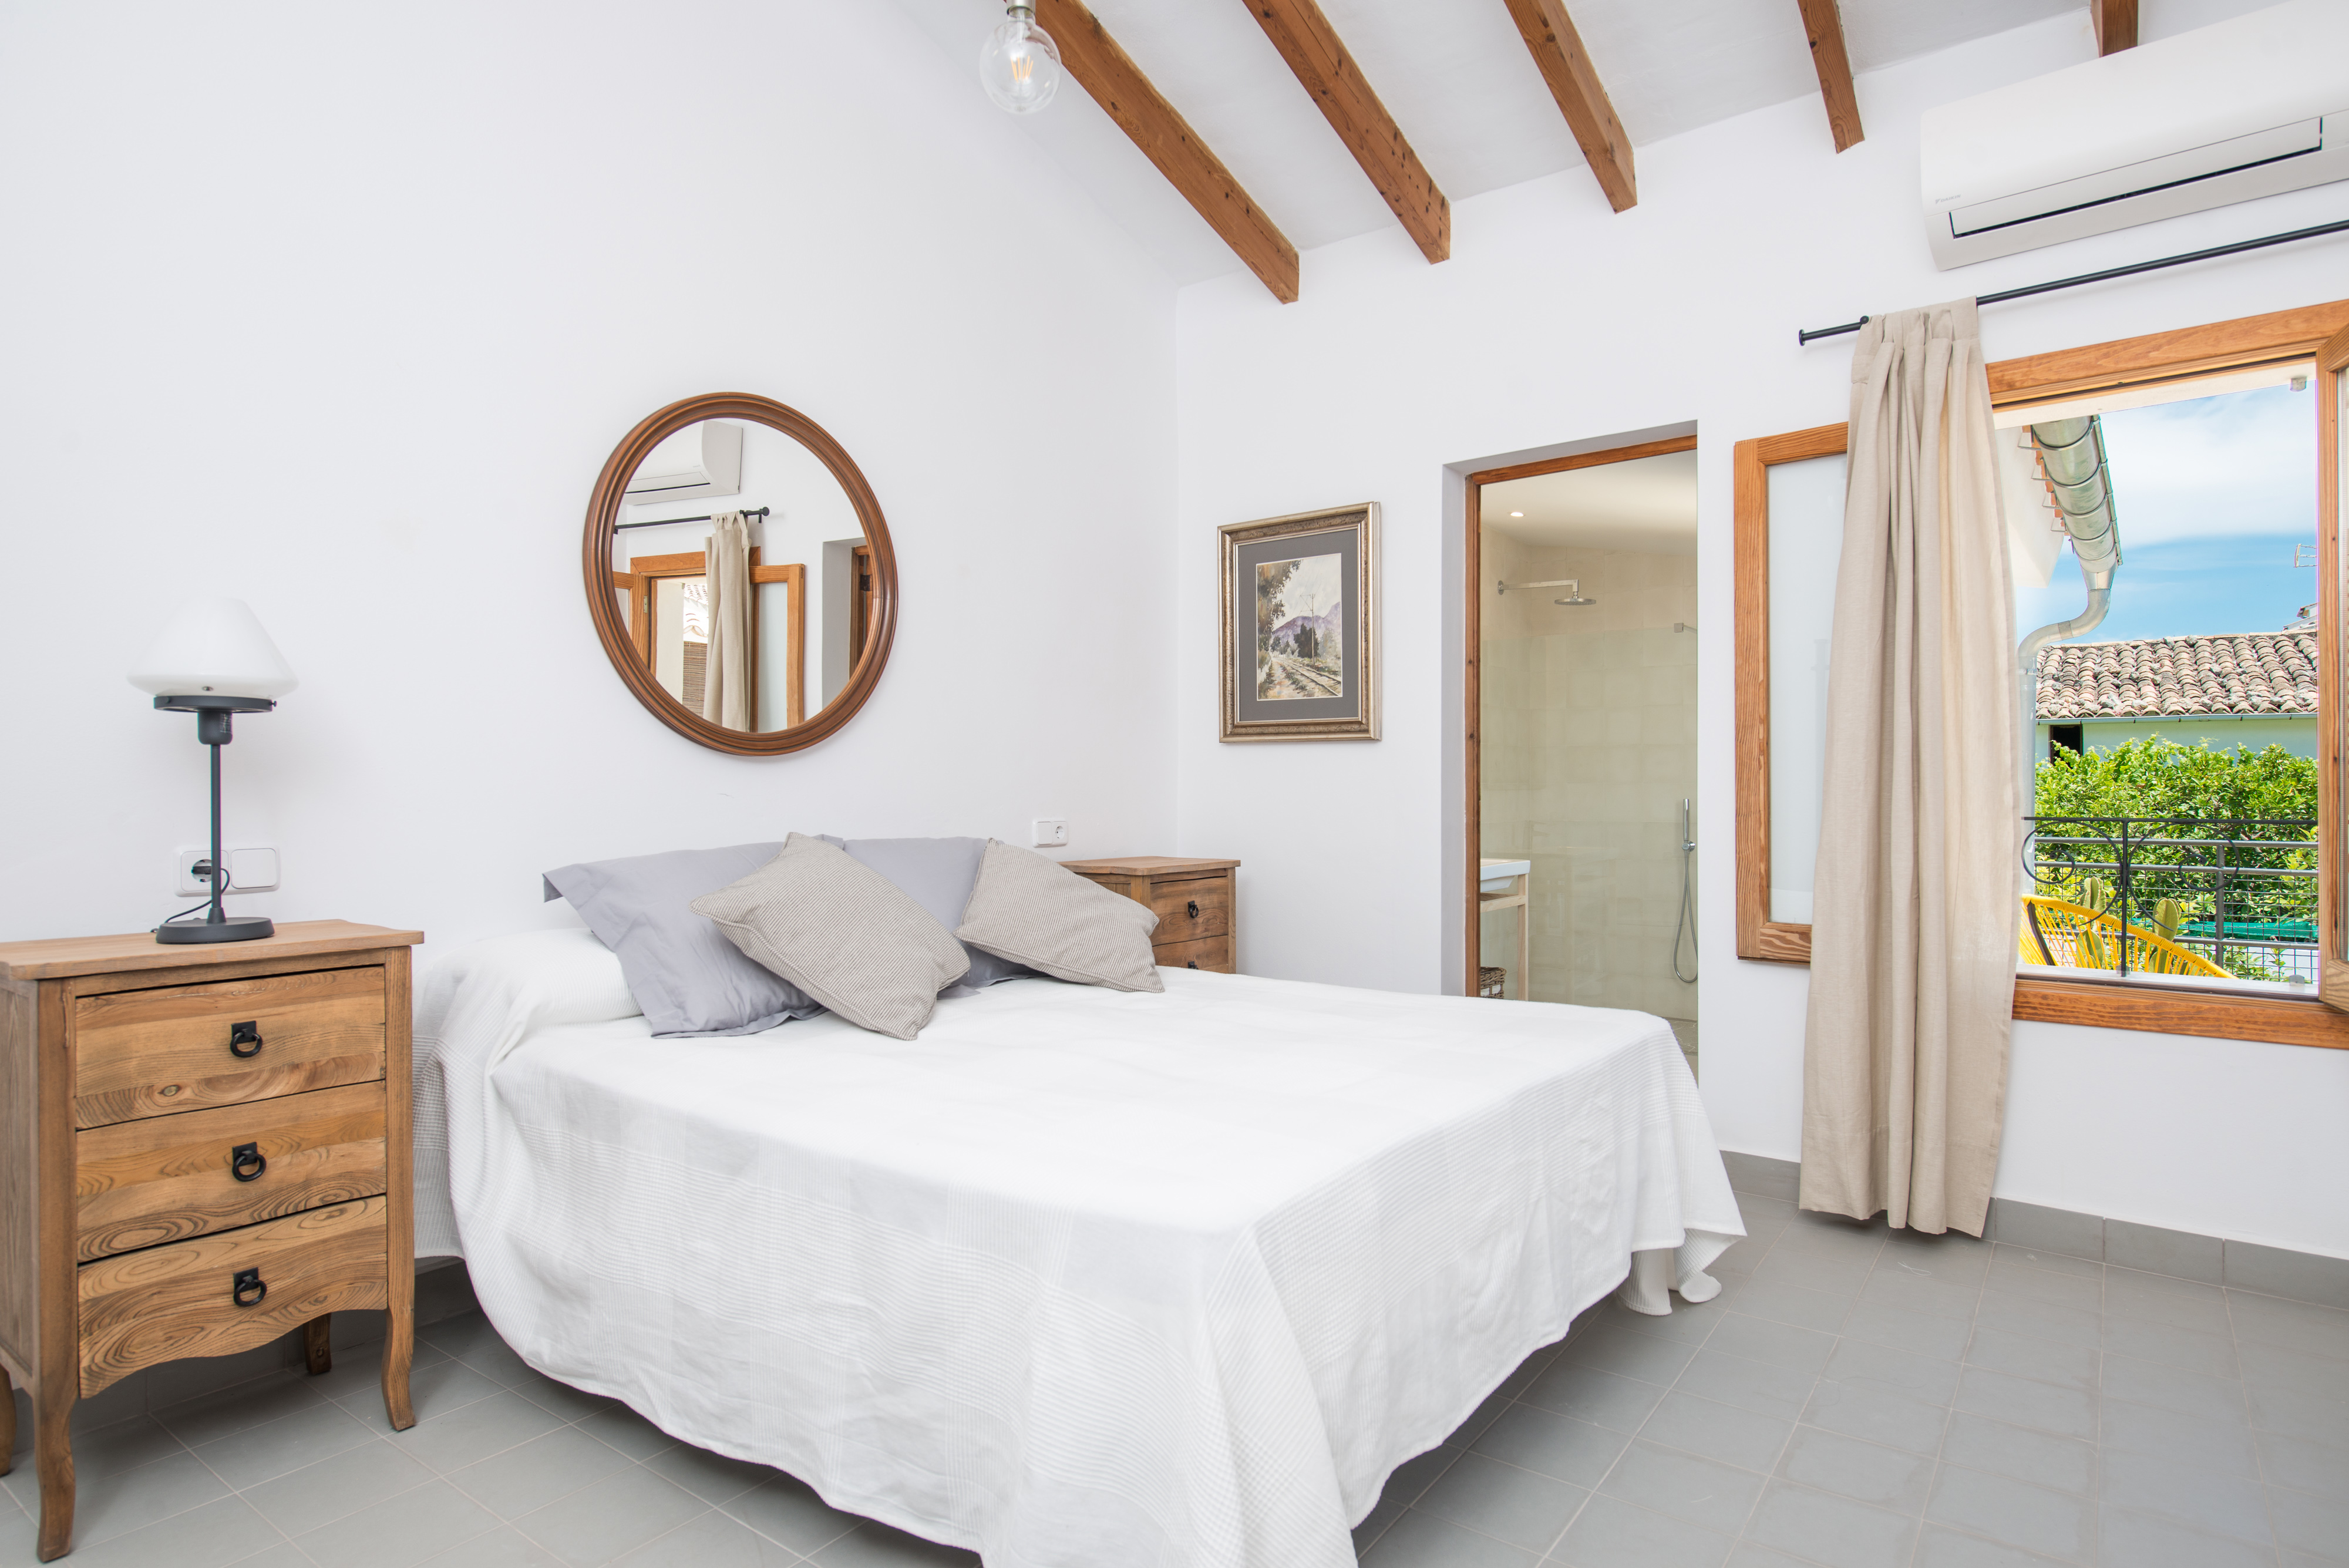 Maison de vacances CA NA MANDOLA (1956247), Alaro, Majorque, Iles Baléares, Espagne, image 17